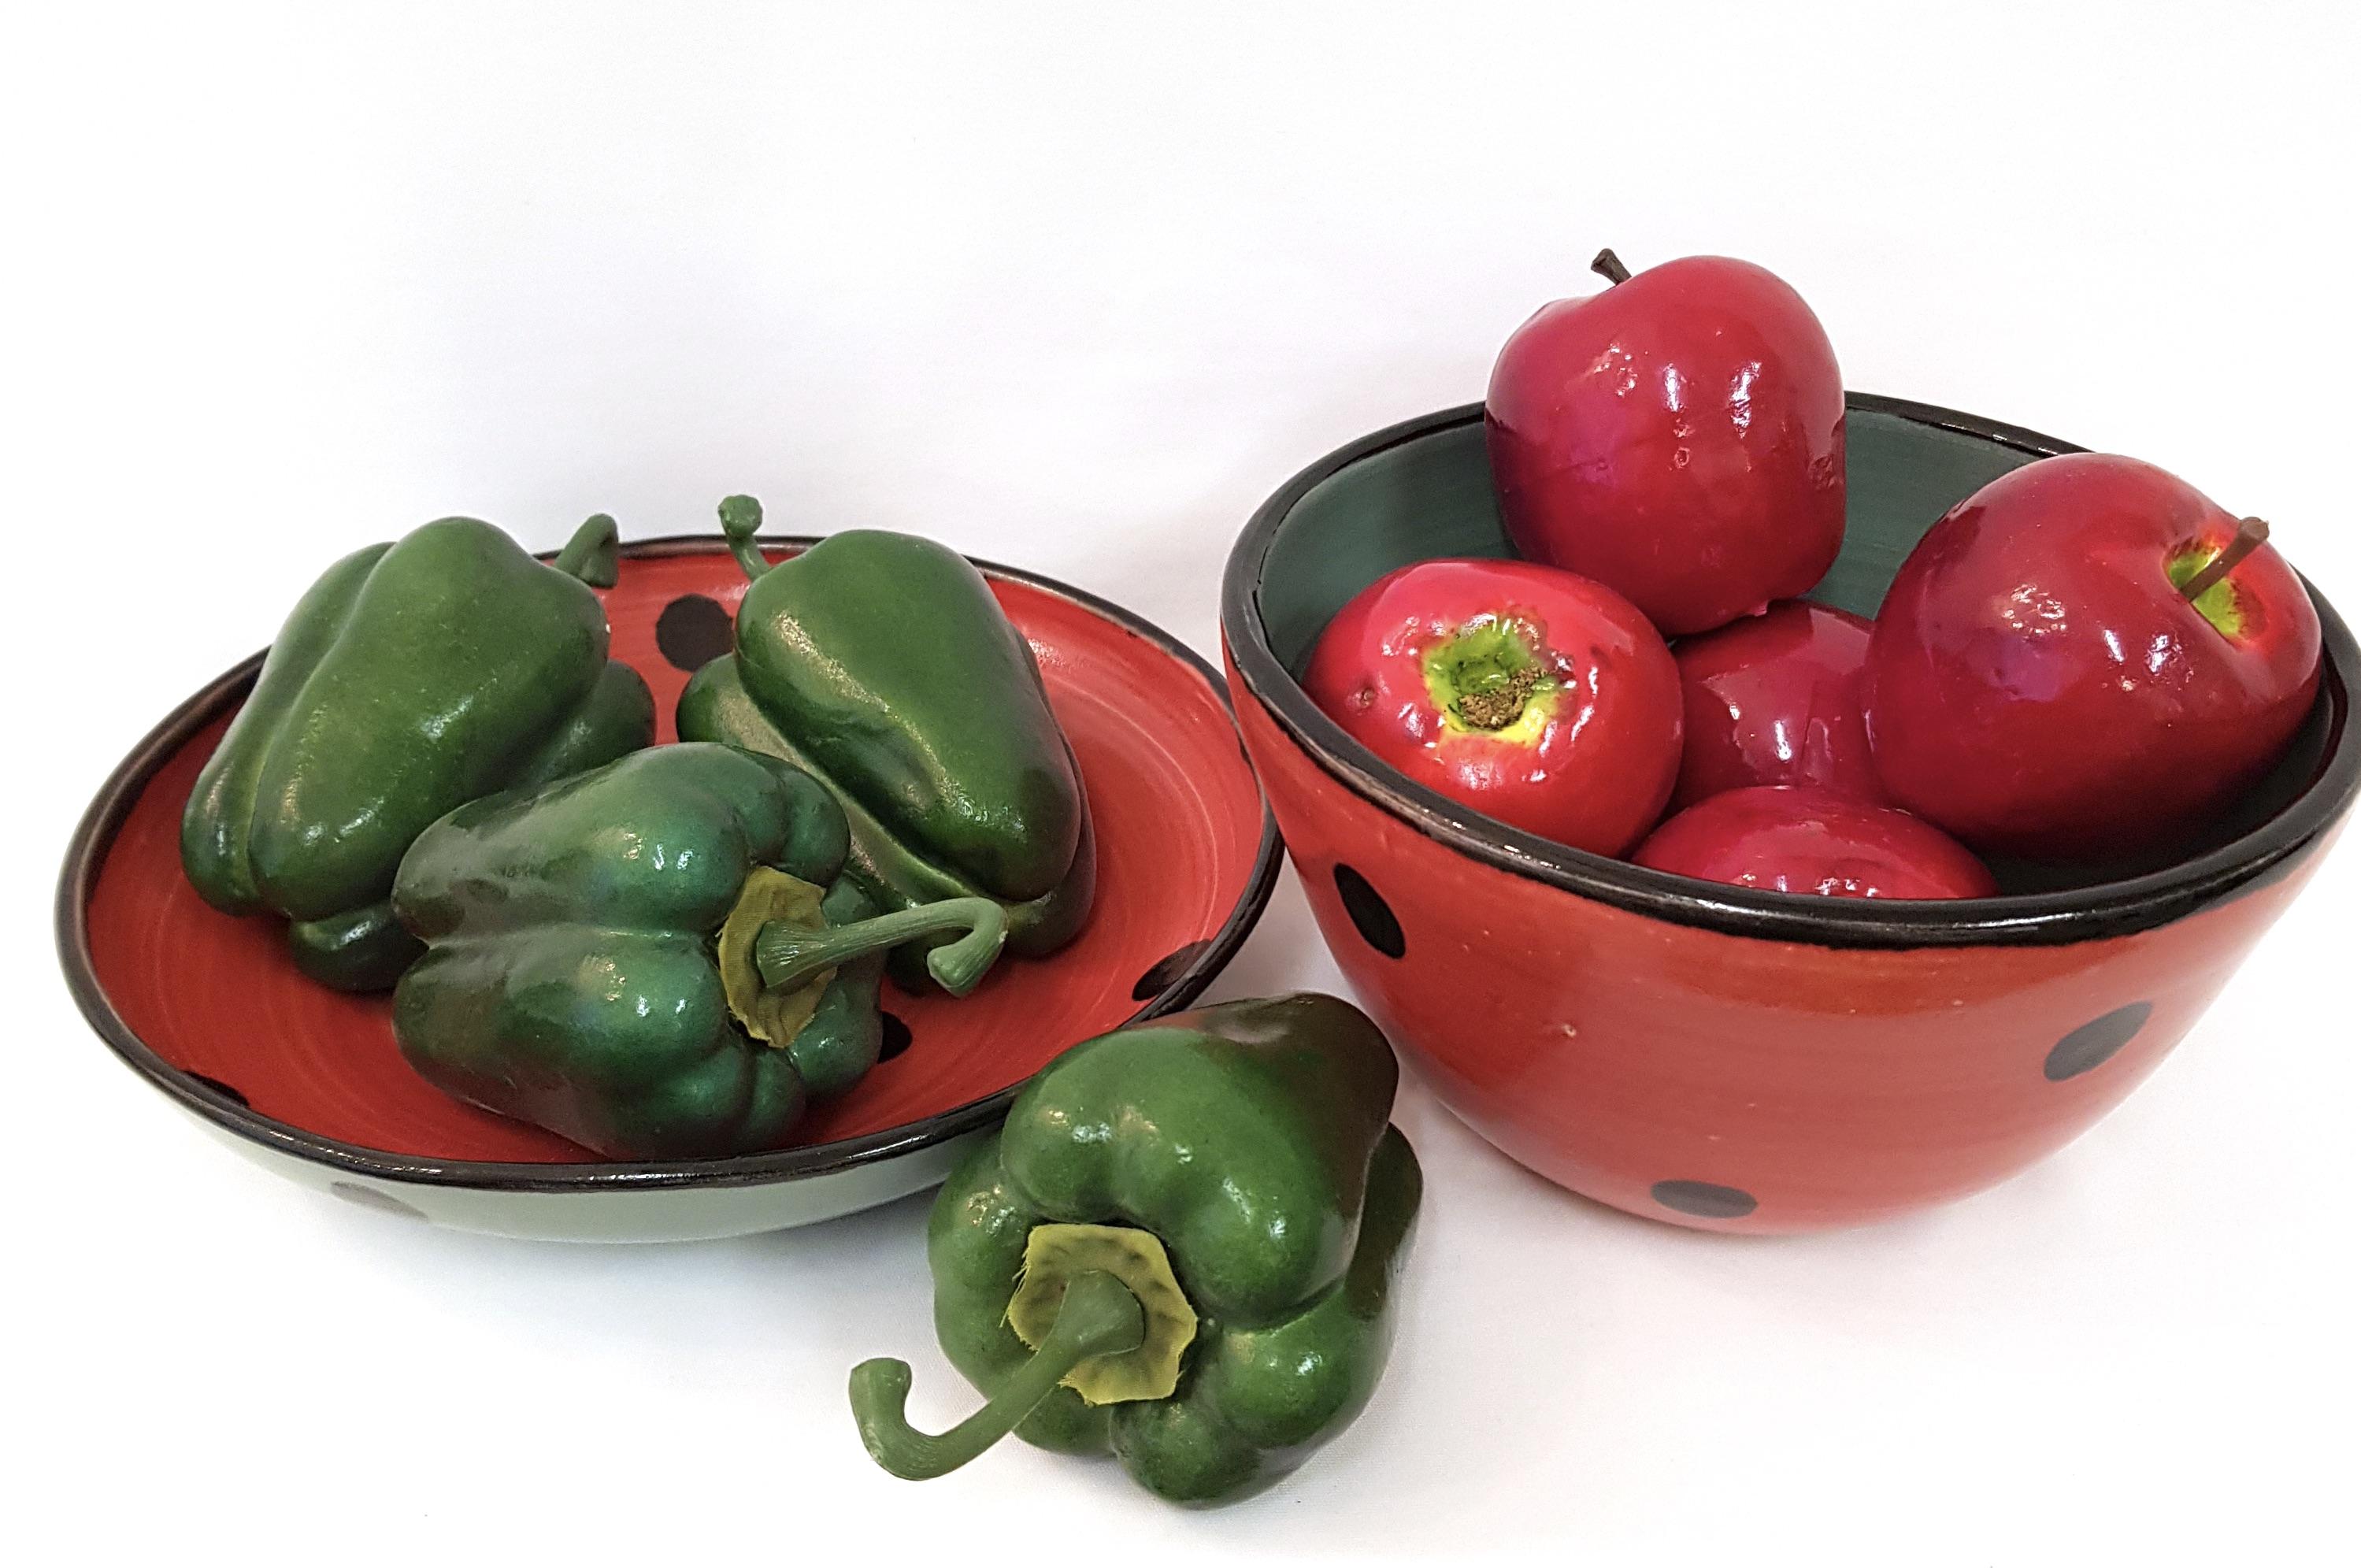 Keramik-Bowl mit Teller, Unikat, Töpferei la ceramica Basel, Töpferkurse, Shop, Keramik, Teamevents